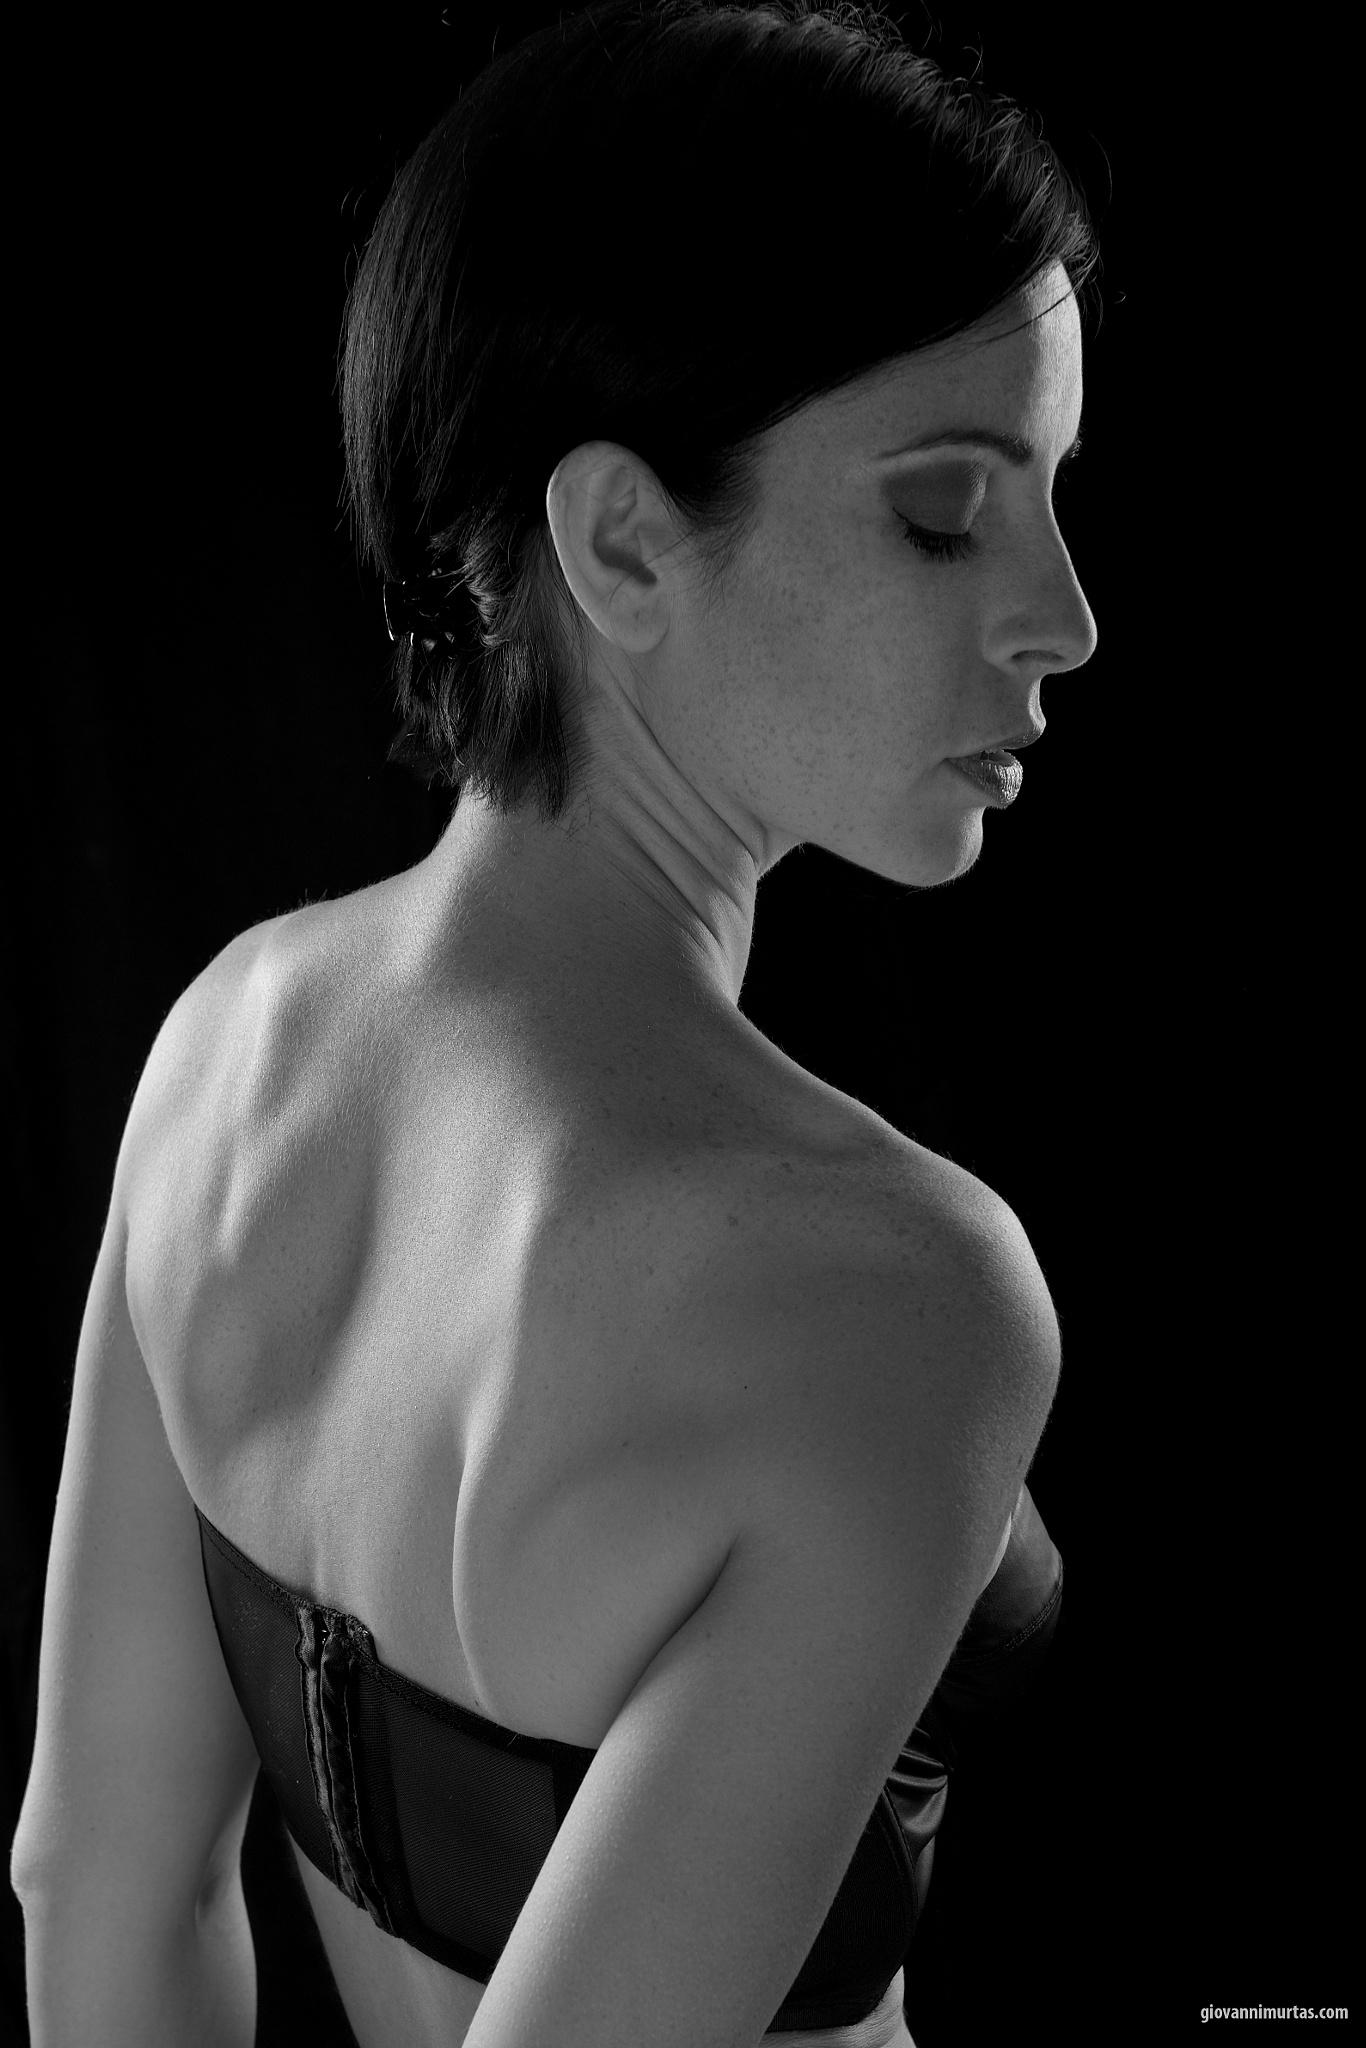 My Muse by Giovanni Murtas